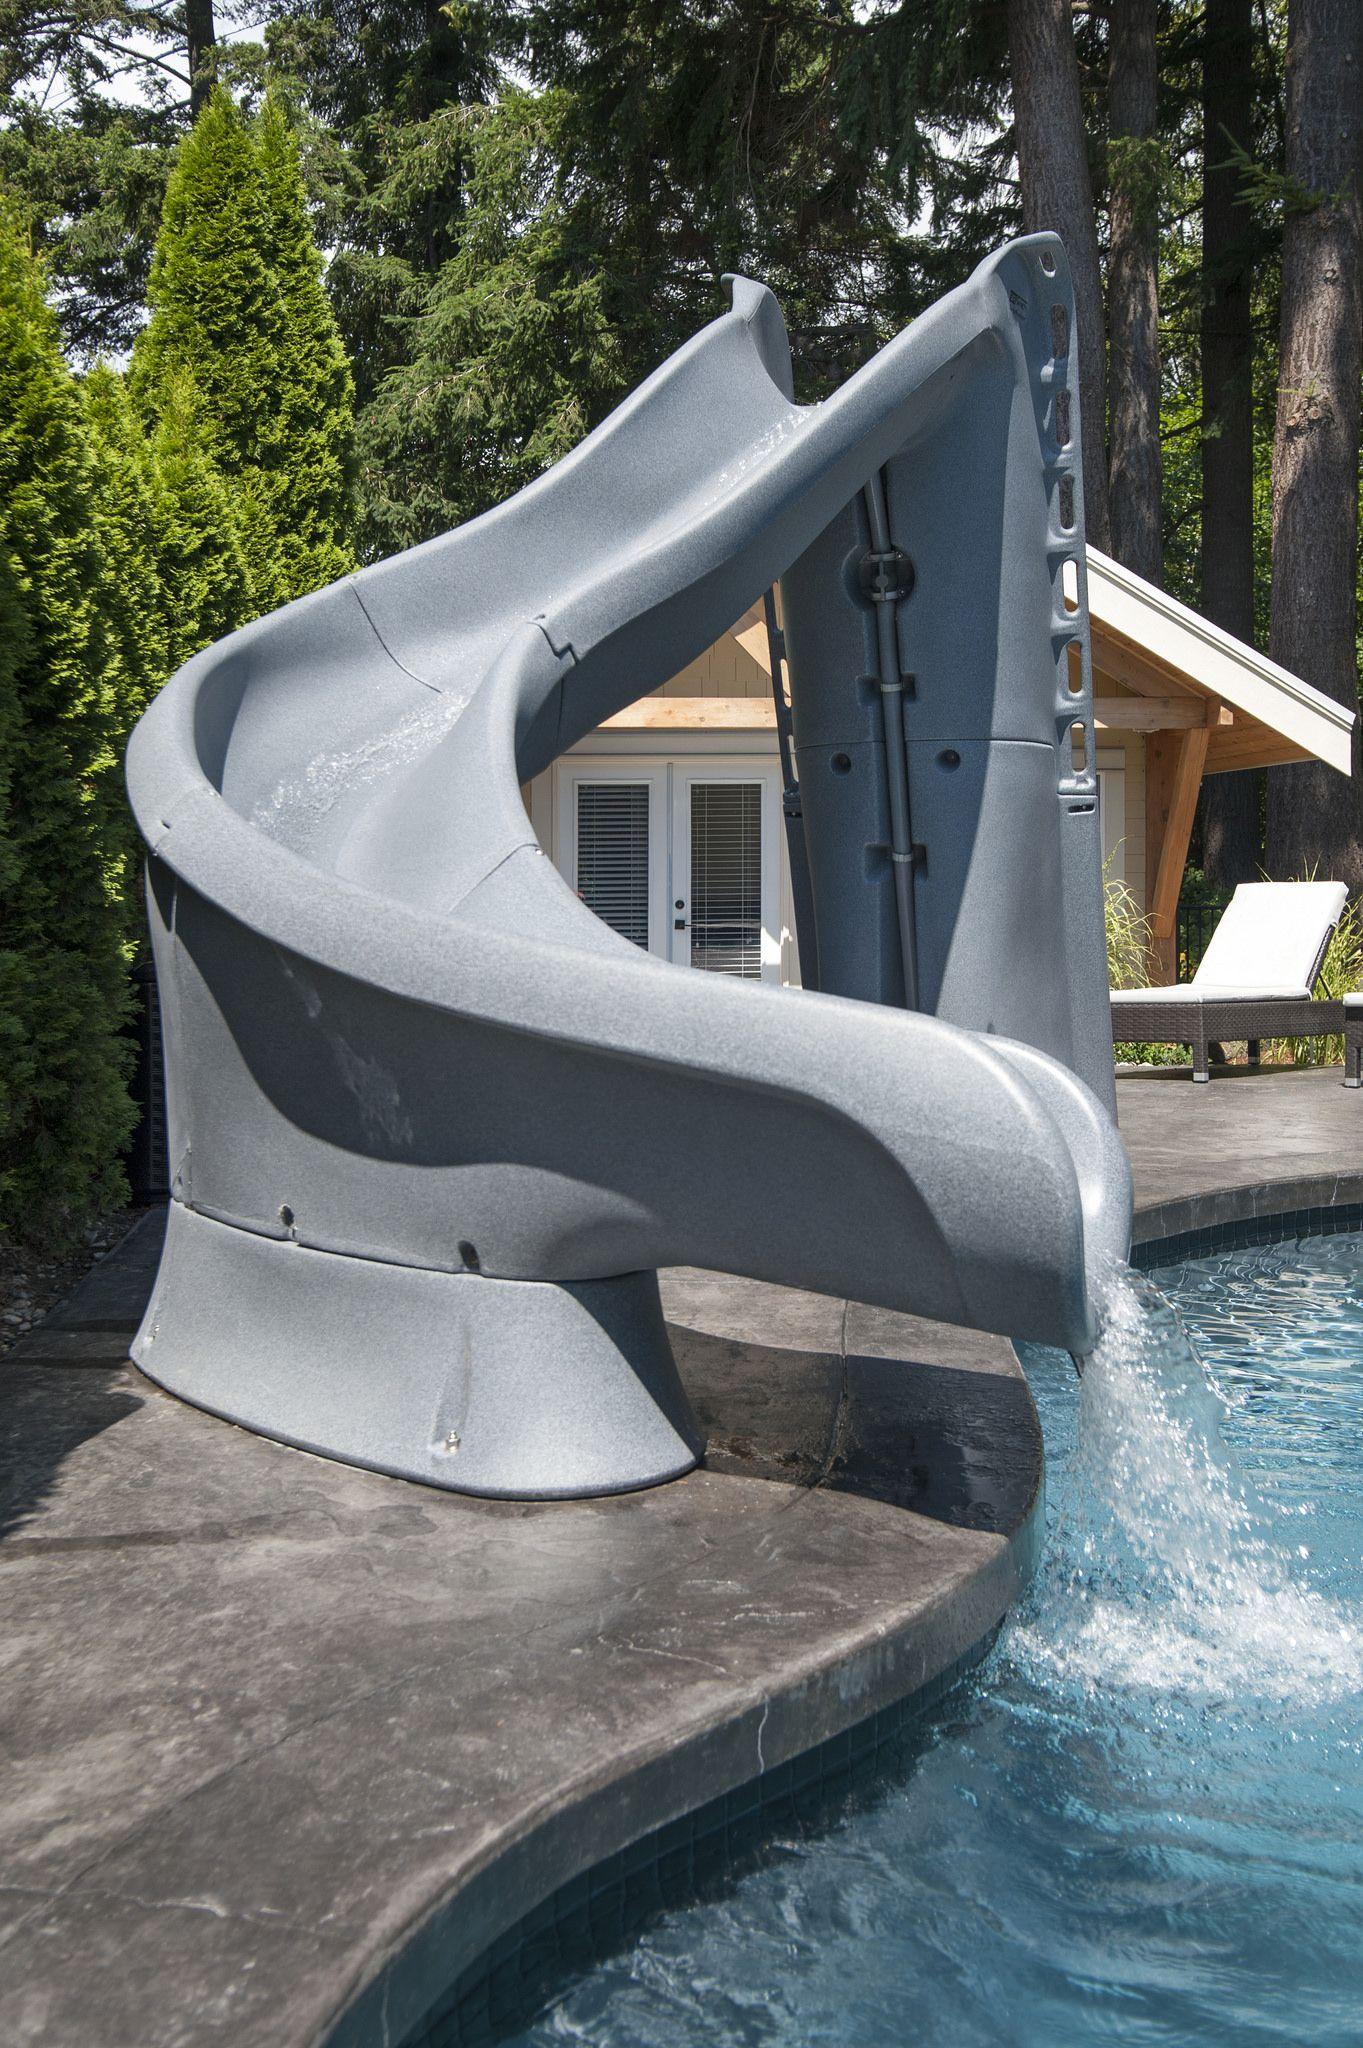 Turbo Twister Slide Dream Pool Indoor Pool Water Slide Swimming Pools